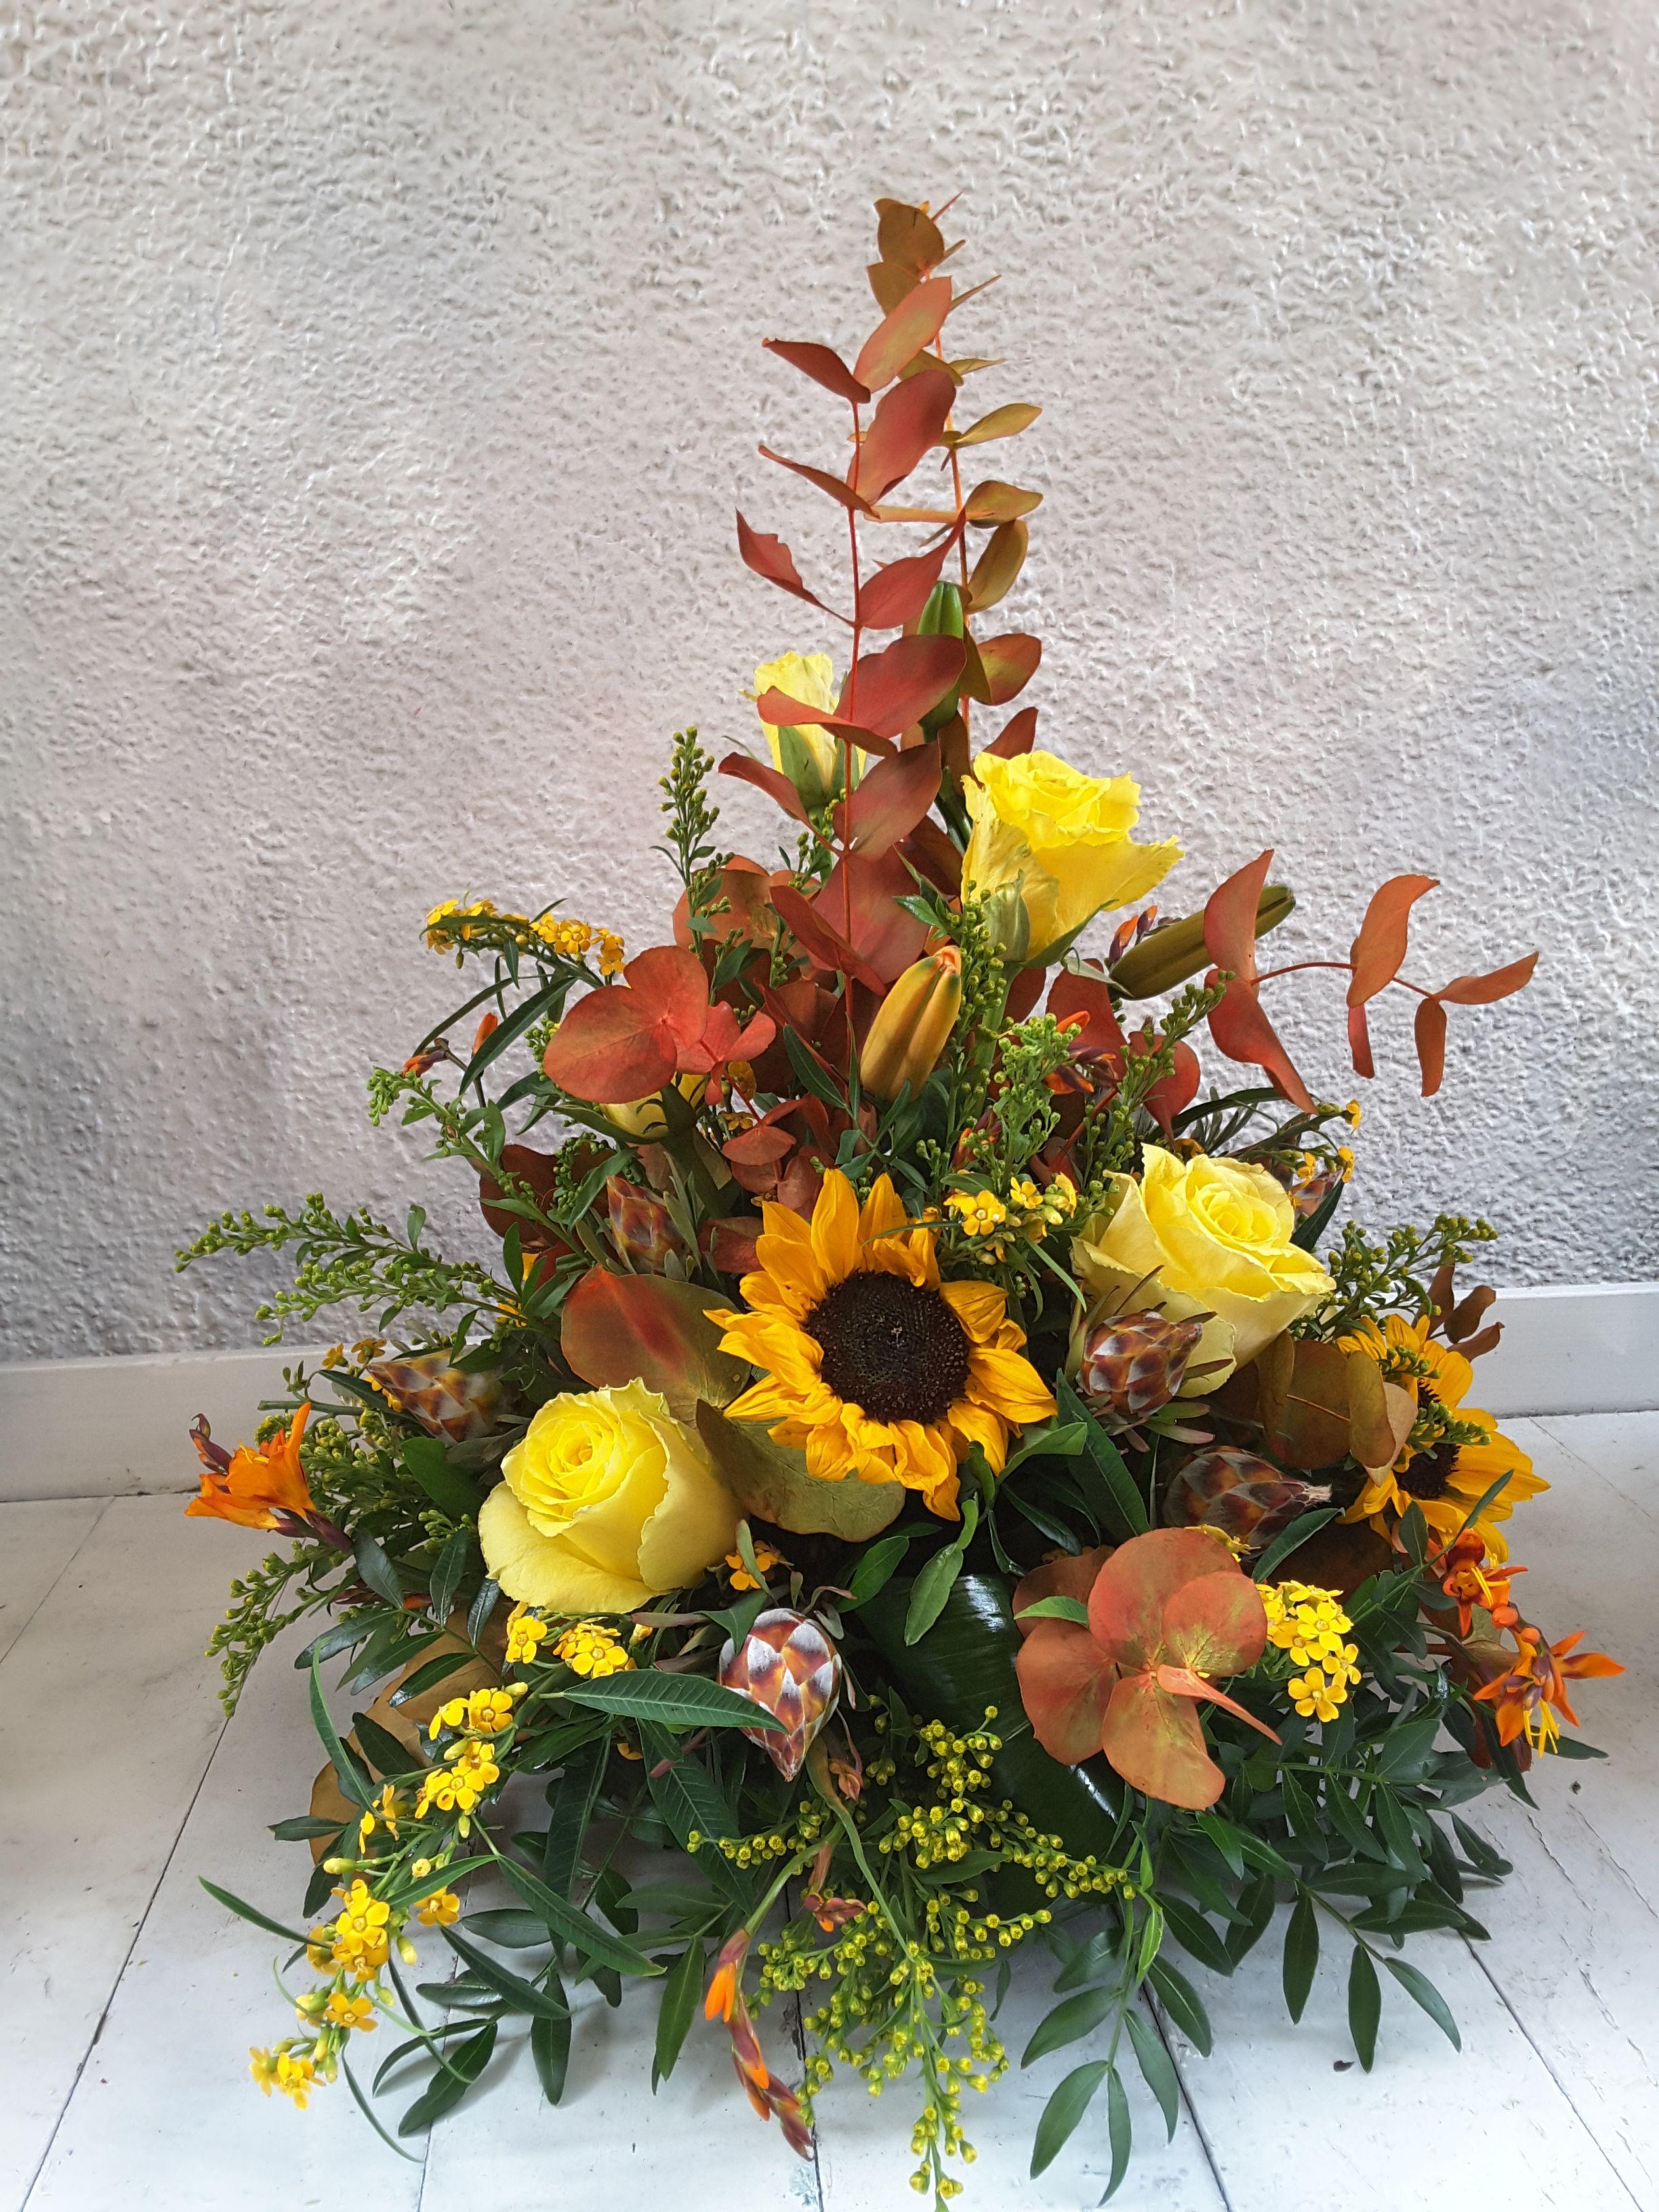 Autumnal Arrangement In Bright Yellows Florist London